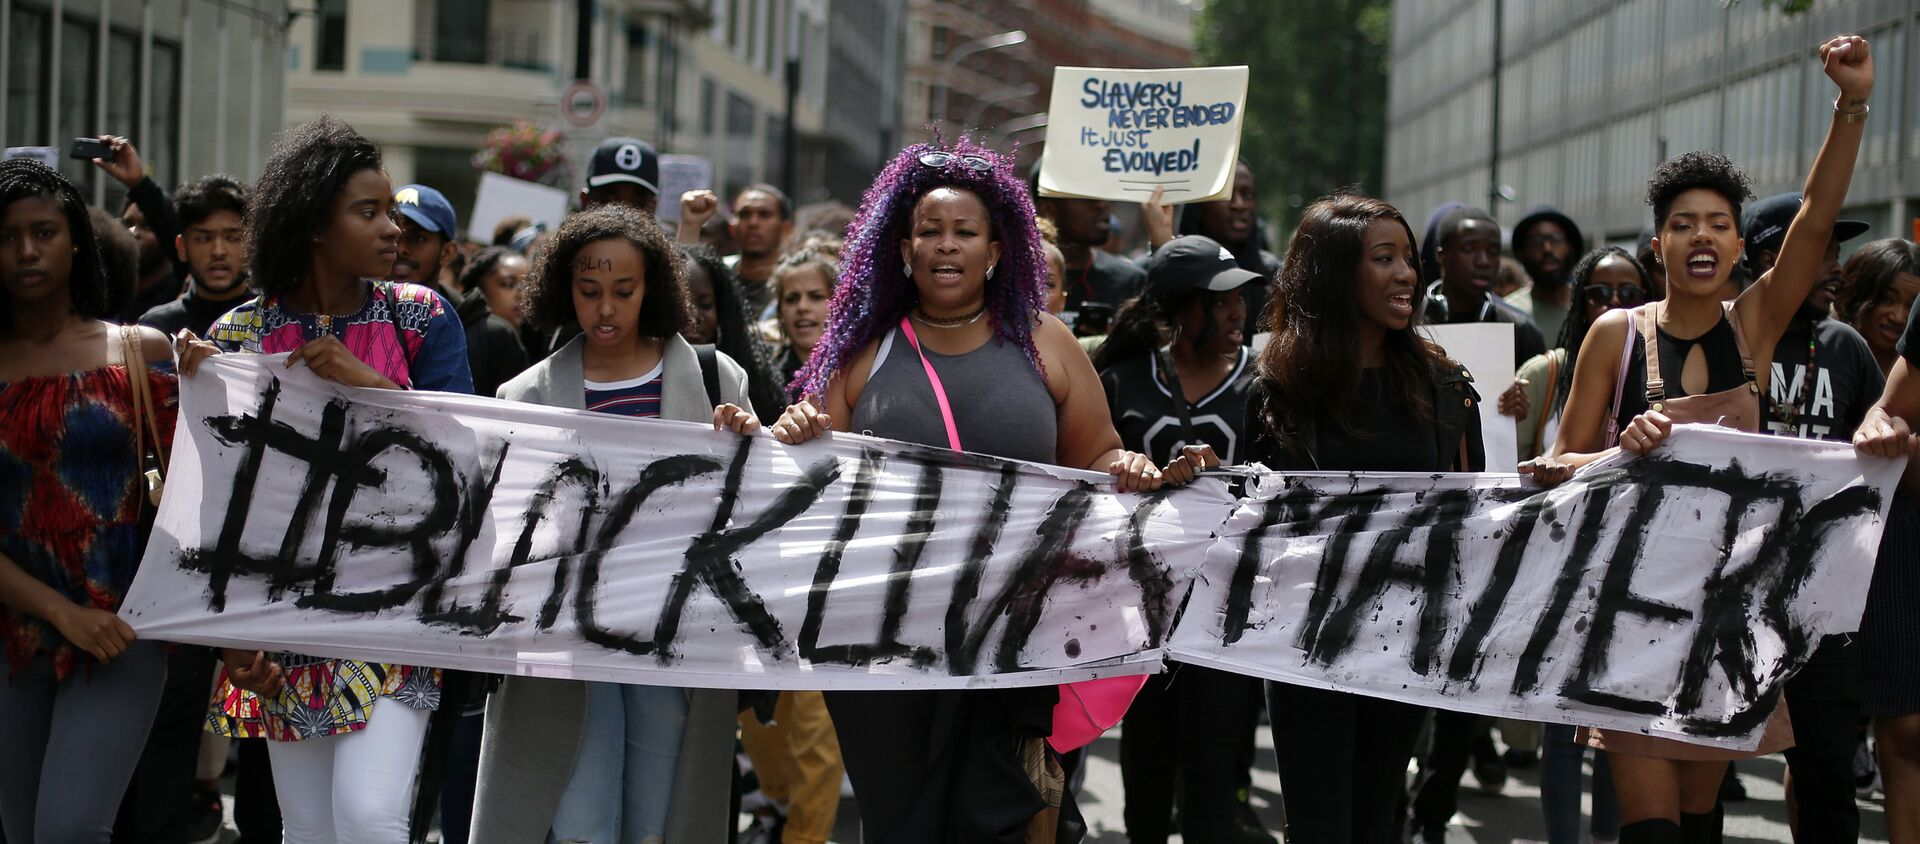 El colectivo Black Lives Matter monta protestas en Inglaterra - Sputnik Mundo, 1920, 04.06.2020